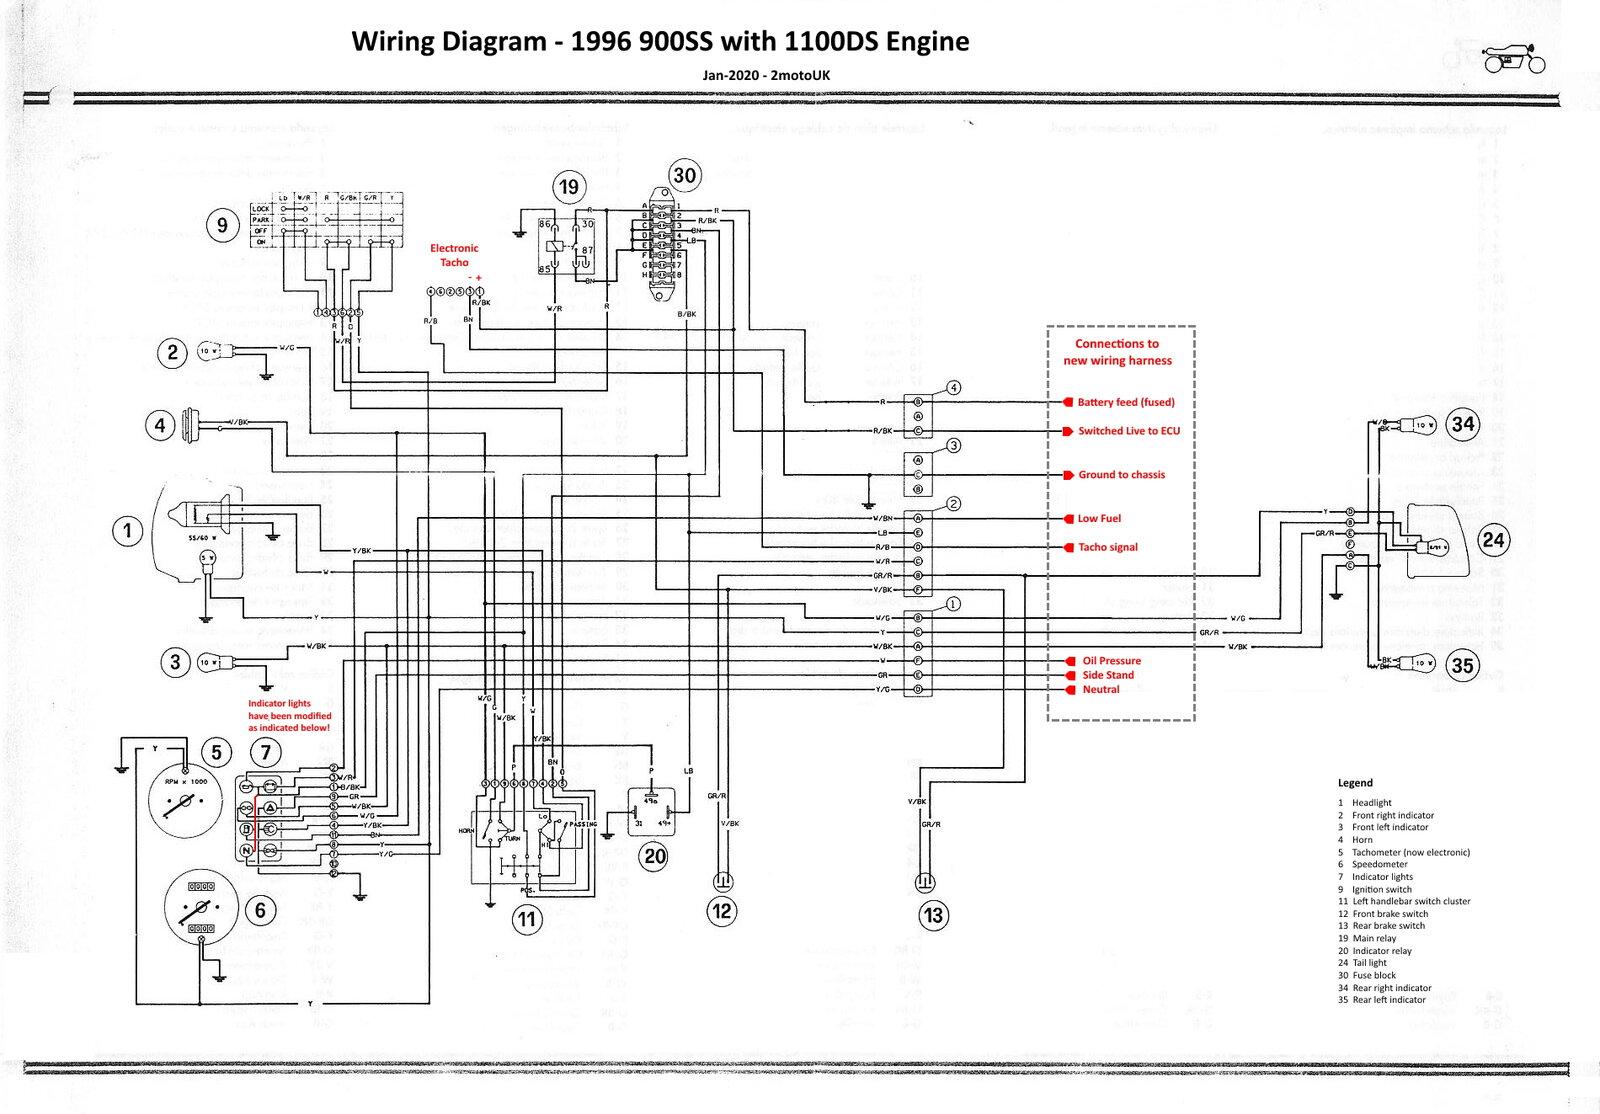 Diagram Ducati Monster 900 Wiring Diagram Full Version Hd Quality Wiring Diagram Sighhrm Fanfaradilegnano It